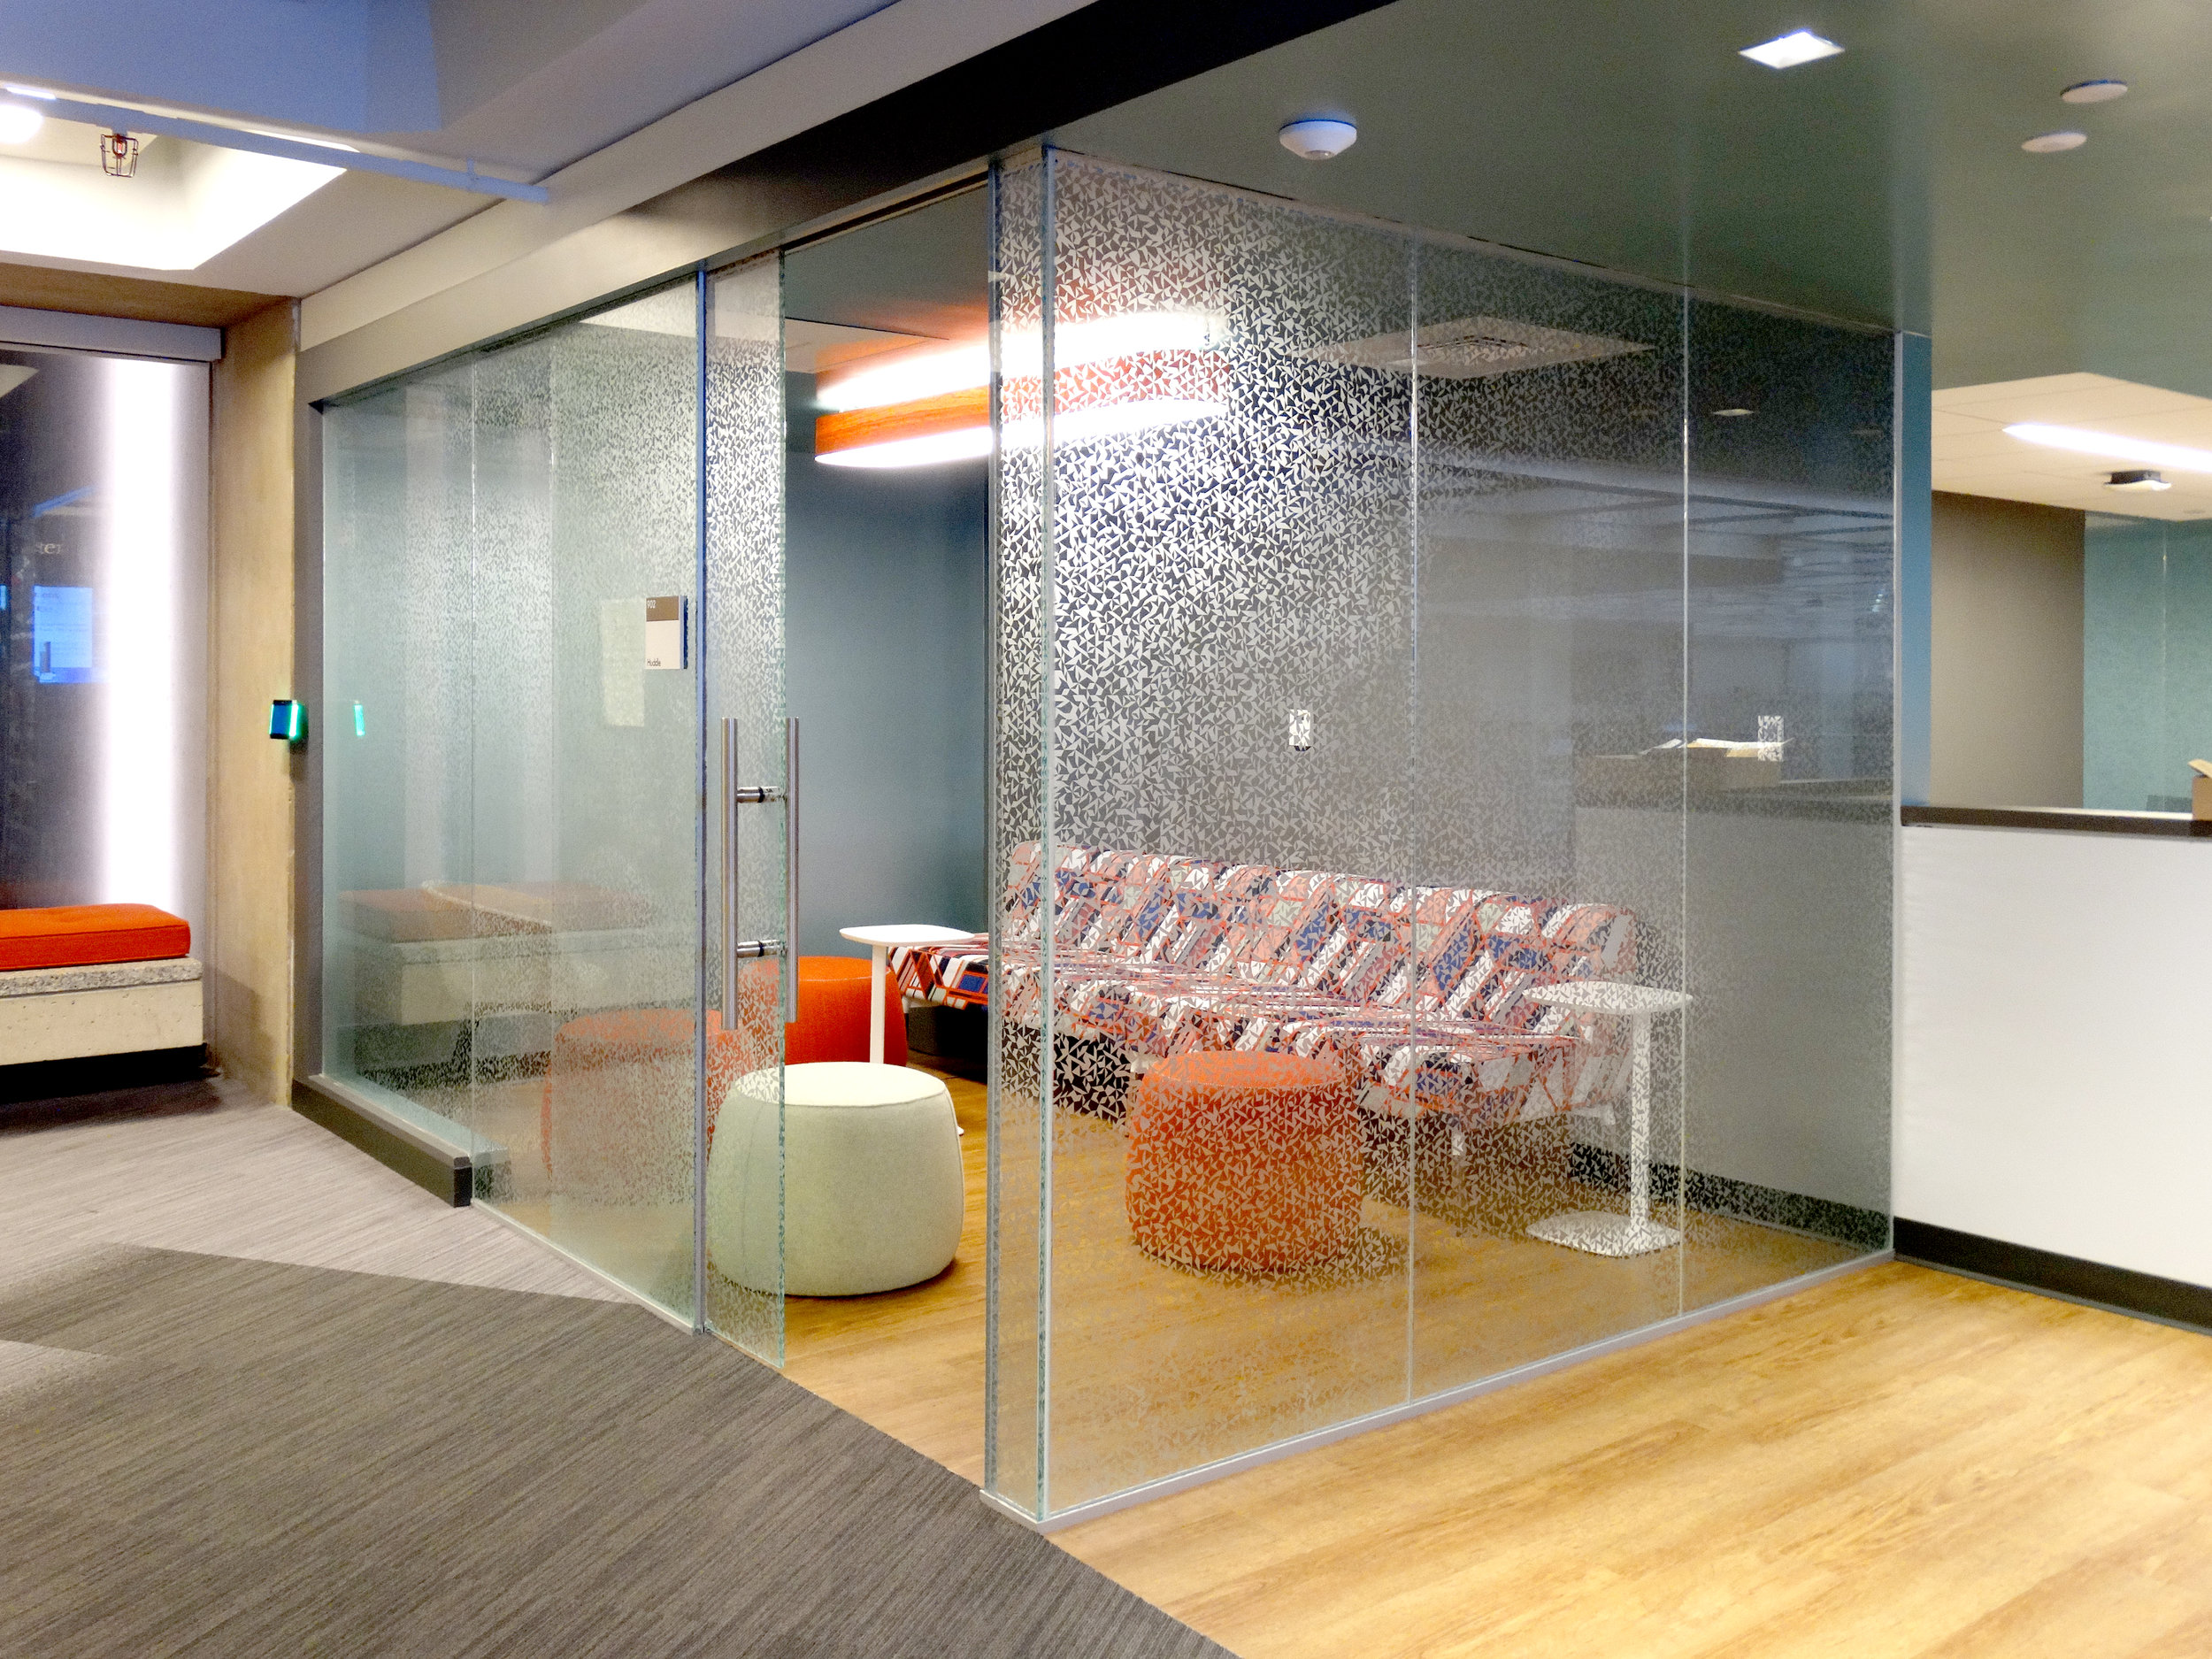 Illume Frameless Glass Huddle Room Glass Box Walls - Spaceworks AI.jpg